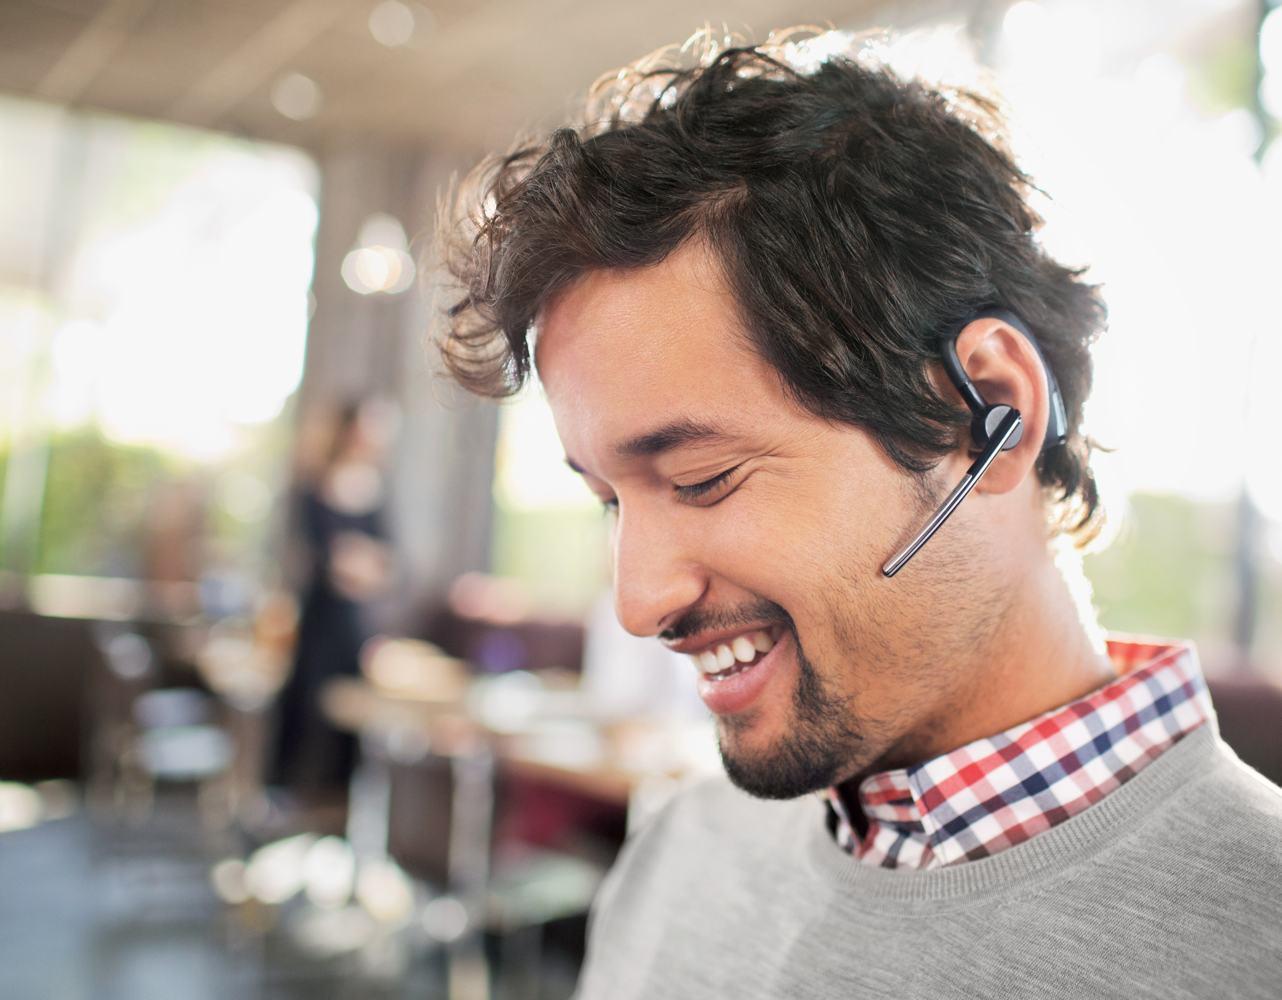 Amazon.com: Plantronics Voyager Legend Wireless Bluetooth